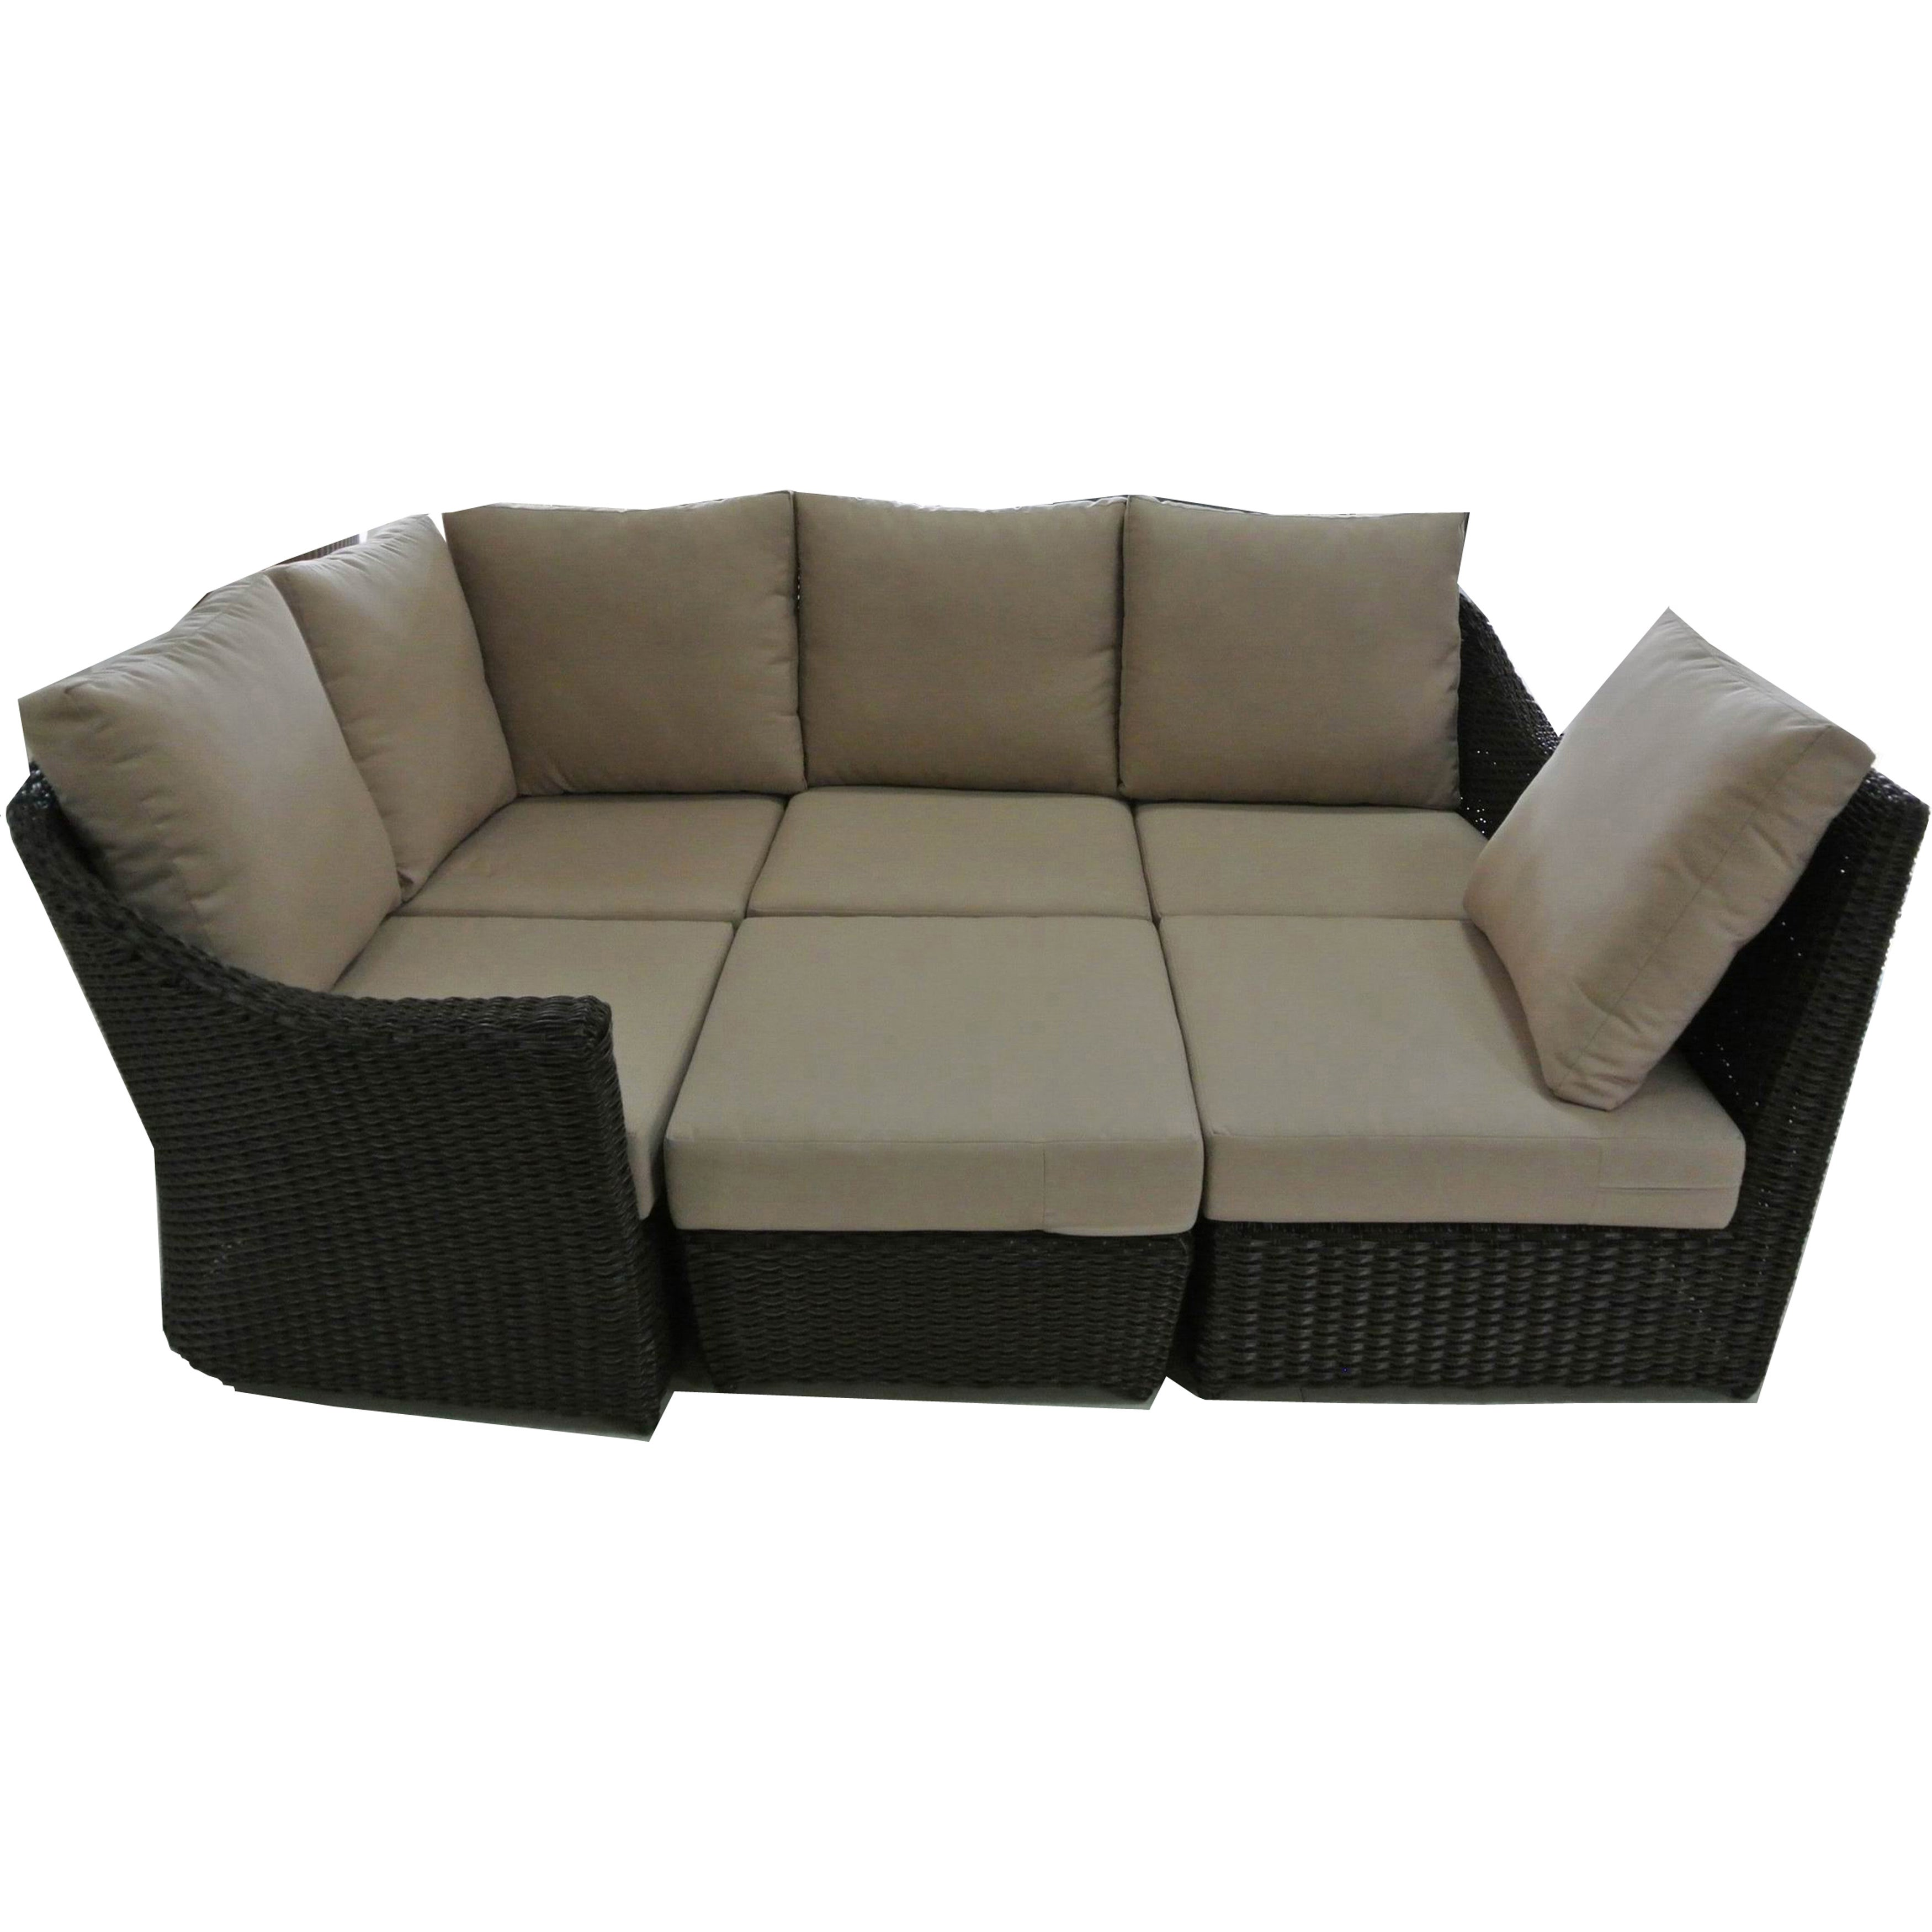 Pleasing Sirio Santra Eight Piece Outdoor Furniture Set Download Free Architecture Designs Aeocymadebymaigaardcom